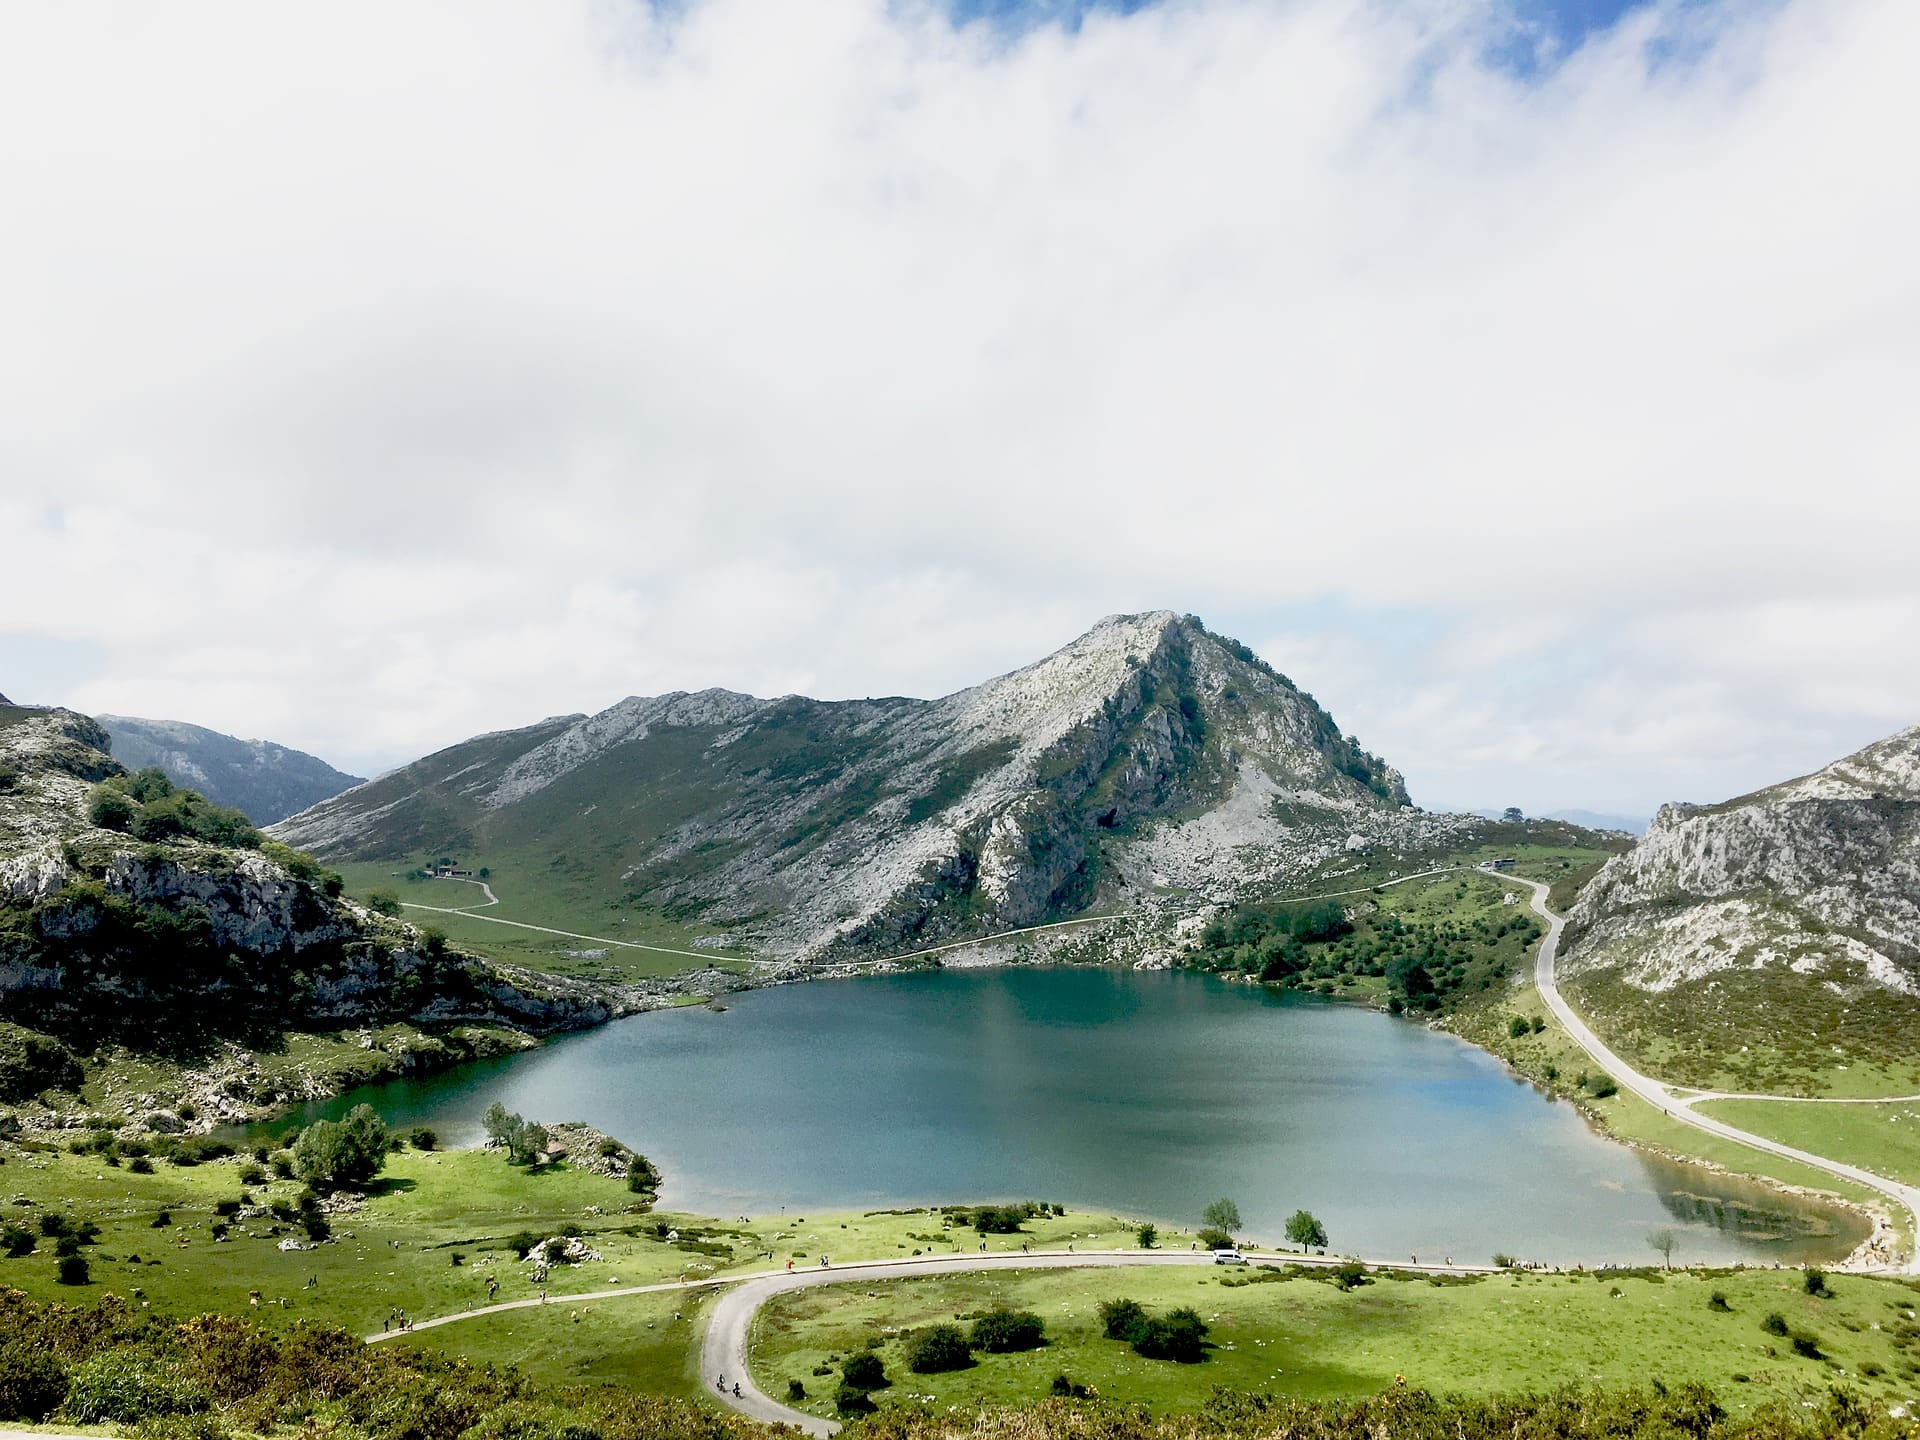 Lagos Covadonga viaje sorpresa wish&Fly